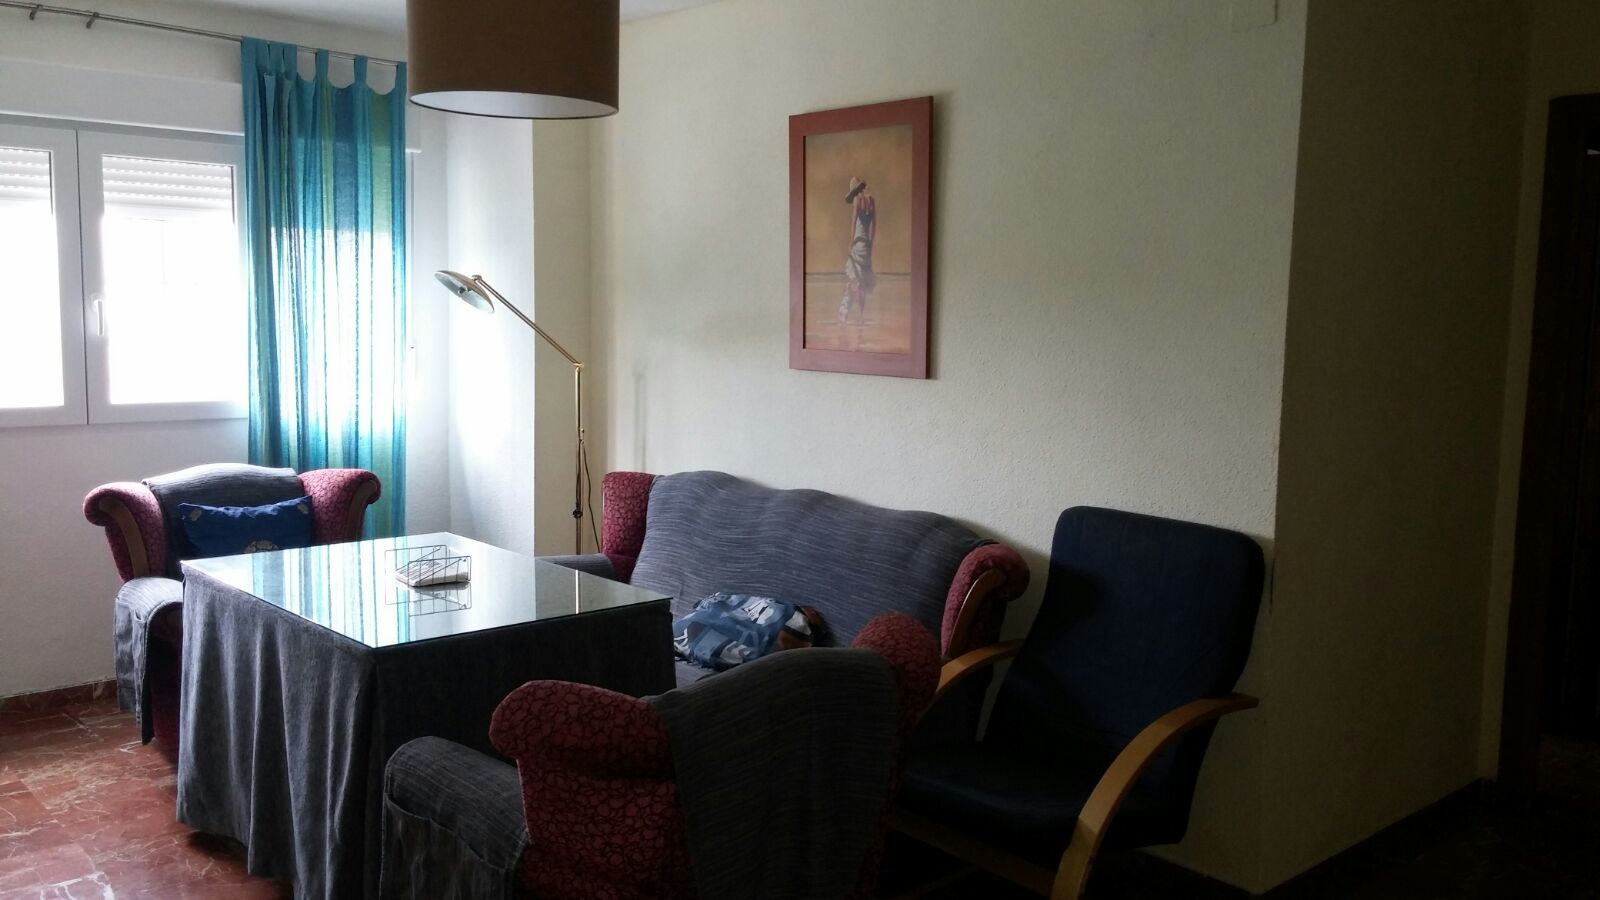 Habitaci n en piso de 4 dormitorios para chica alquiler for Piso 4 dormitorios teatinos malaga